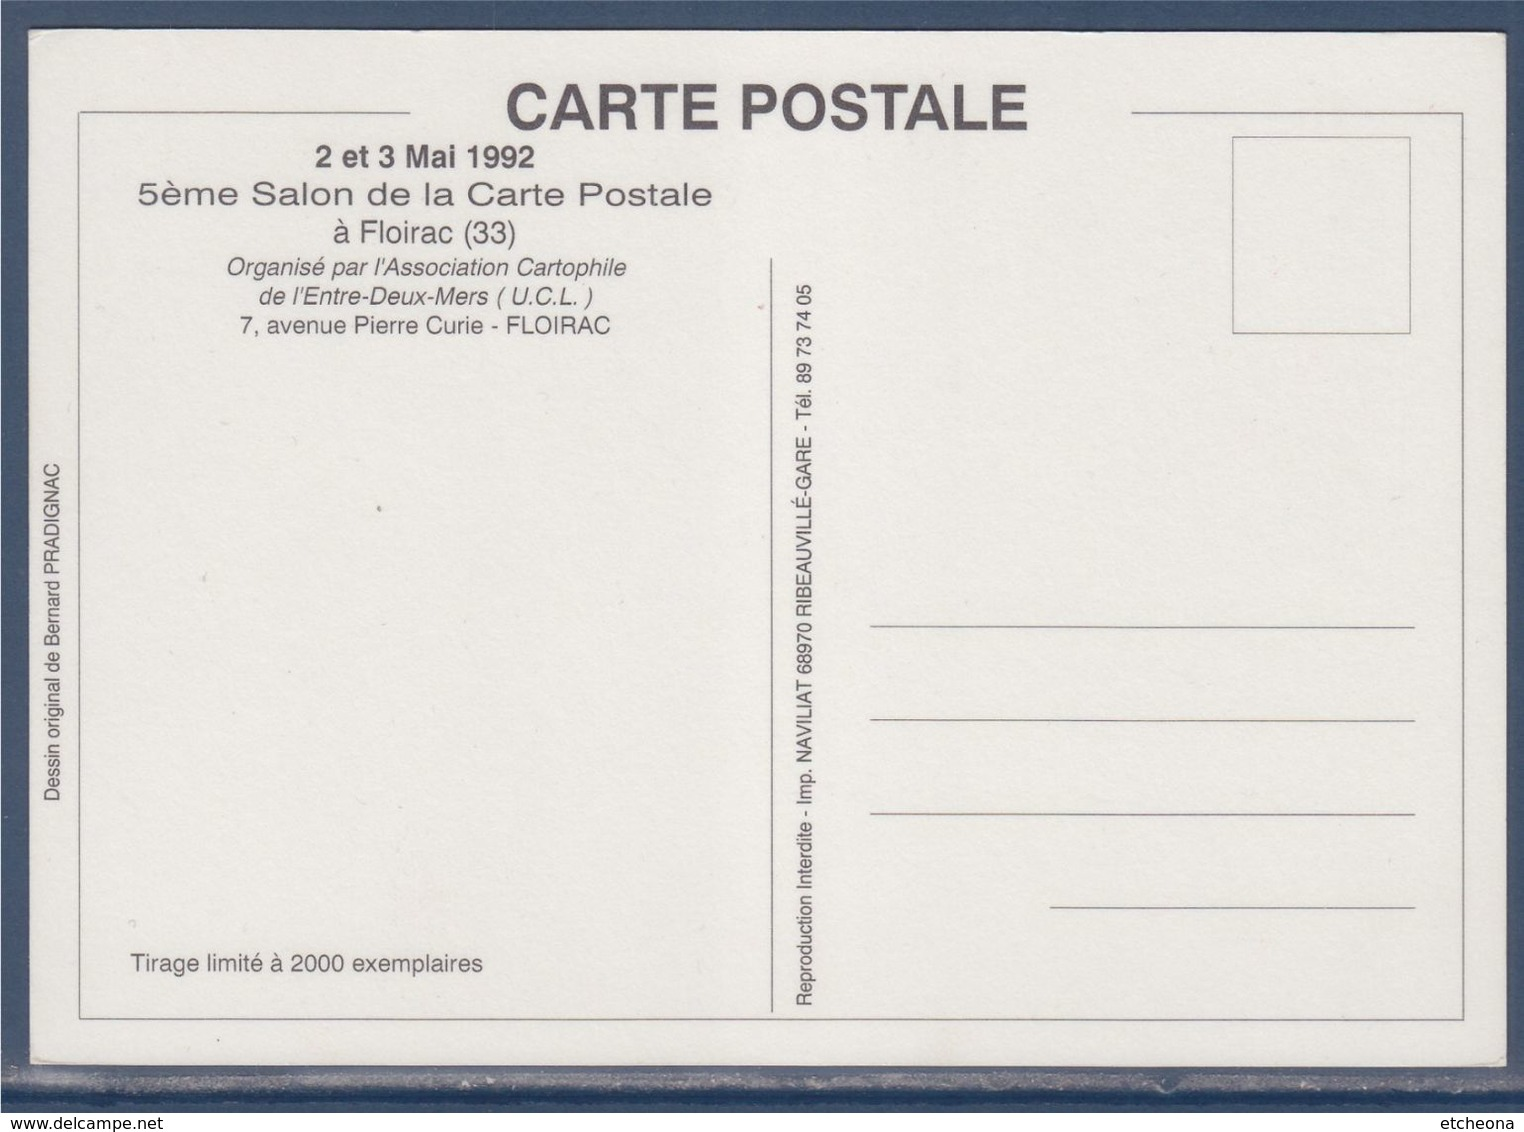 = 57ème Salon De La Carte Postale, Floirac, 2-3 Mai 1992, Association Cartophile De L'Entre Deux Mers, - Sammlerbörsen & Sammlerausstellungen